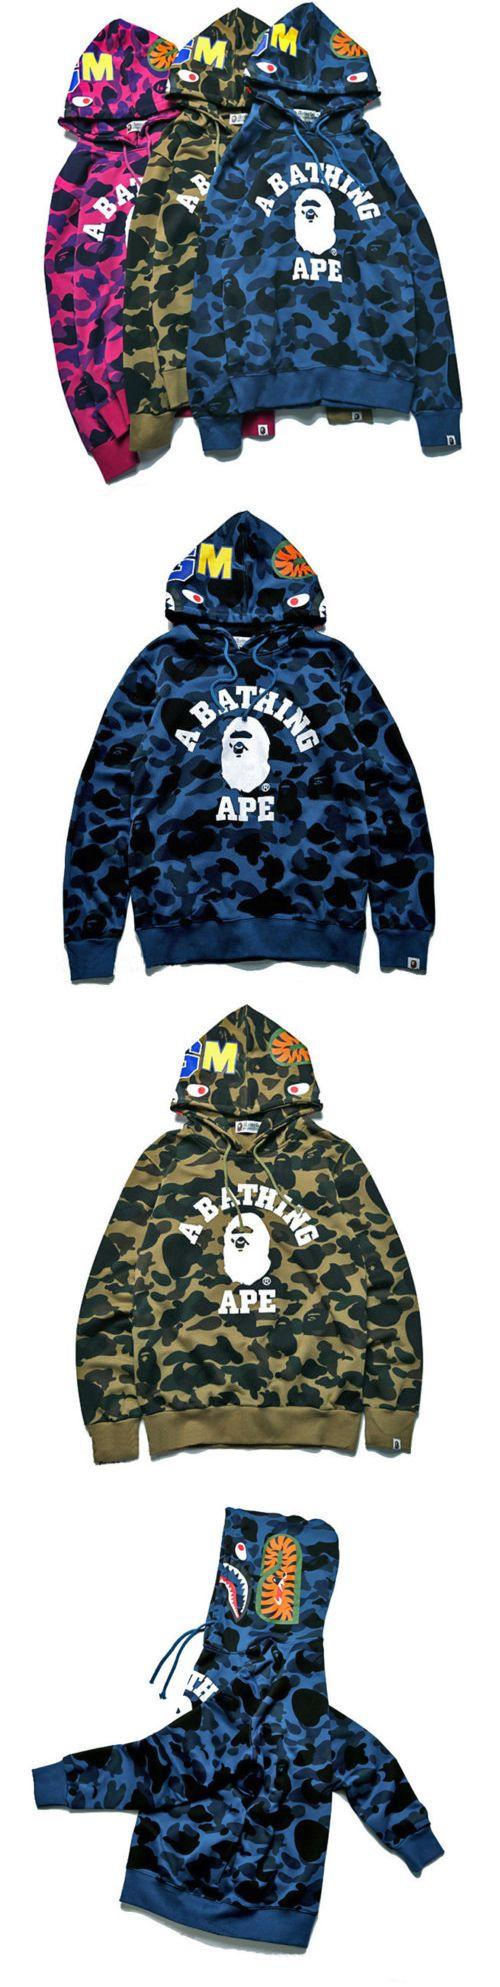 Sweatshirts Hoodies 155194: A Bathing Ape Hoodie Bape Shark Jacke Camo Jacket Pullover Sweatshirt Coat Bape -> BUY IT NOW ONLY: $37.59 on eBay!